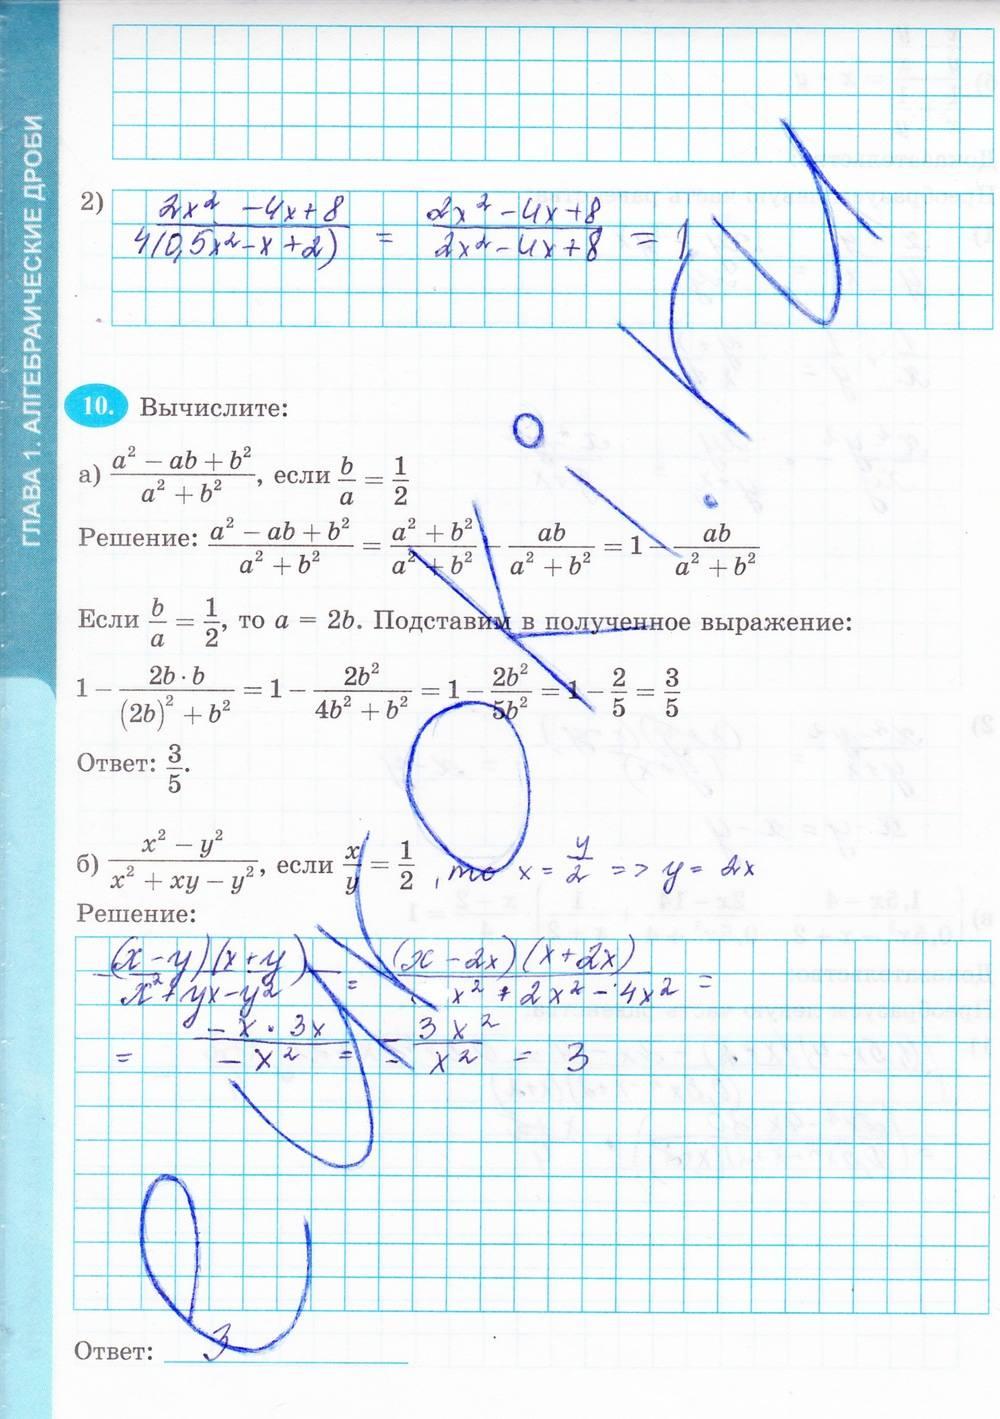 тесты ключникова 8 класс гдз